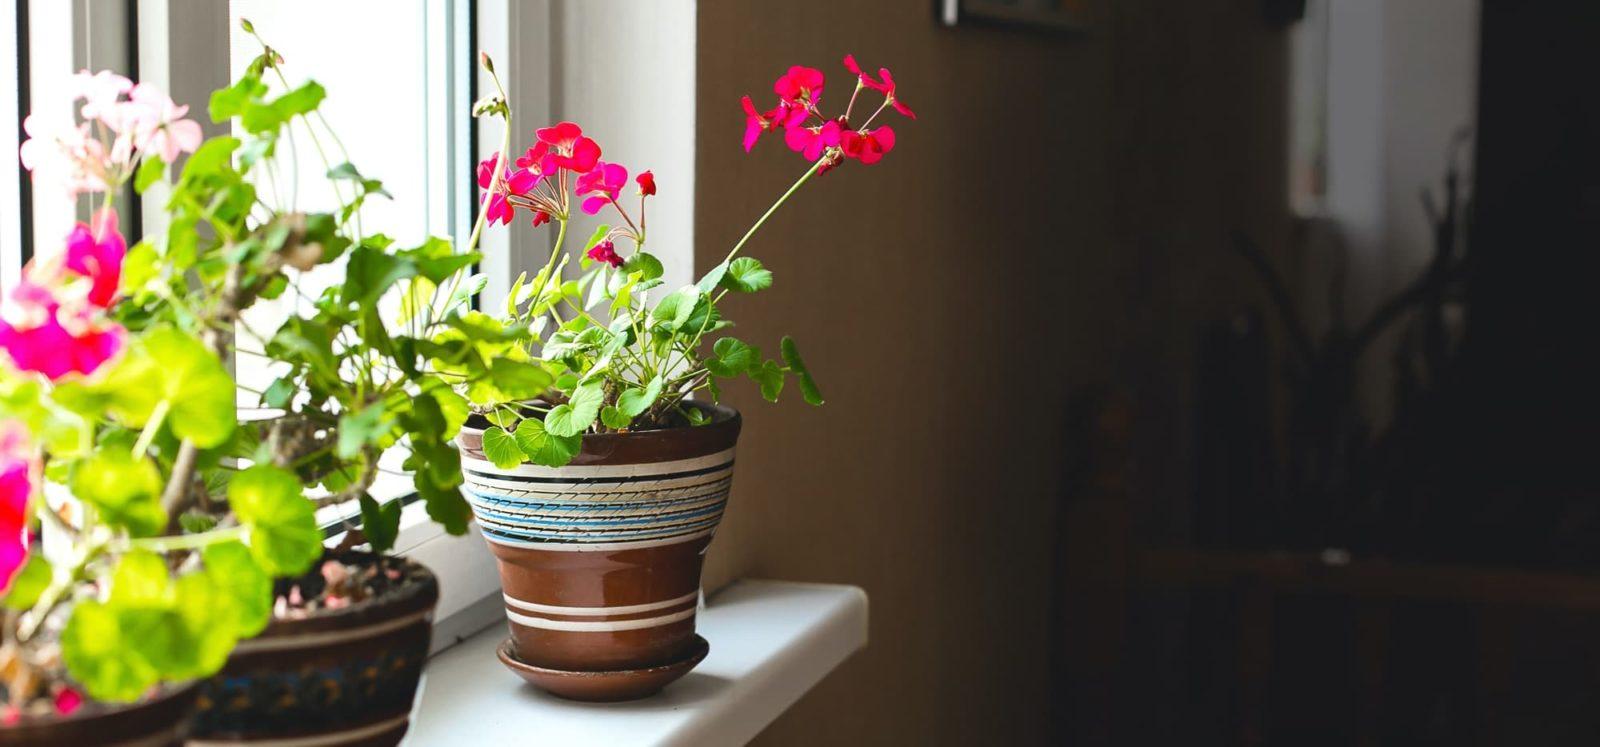 geranium pots on a windowsill